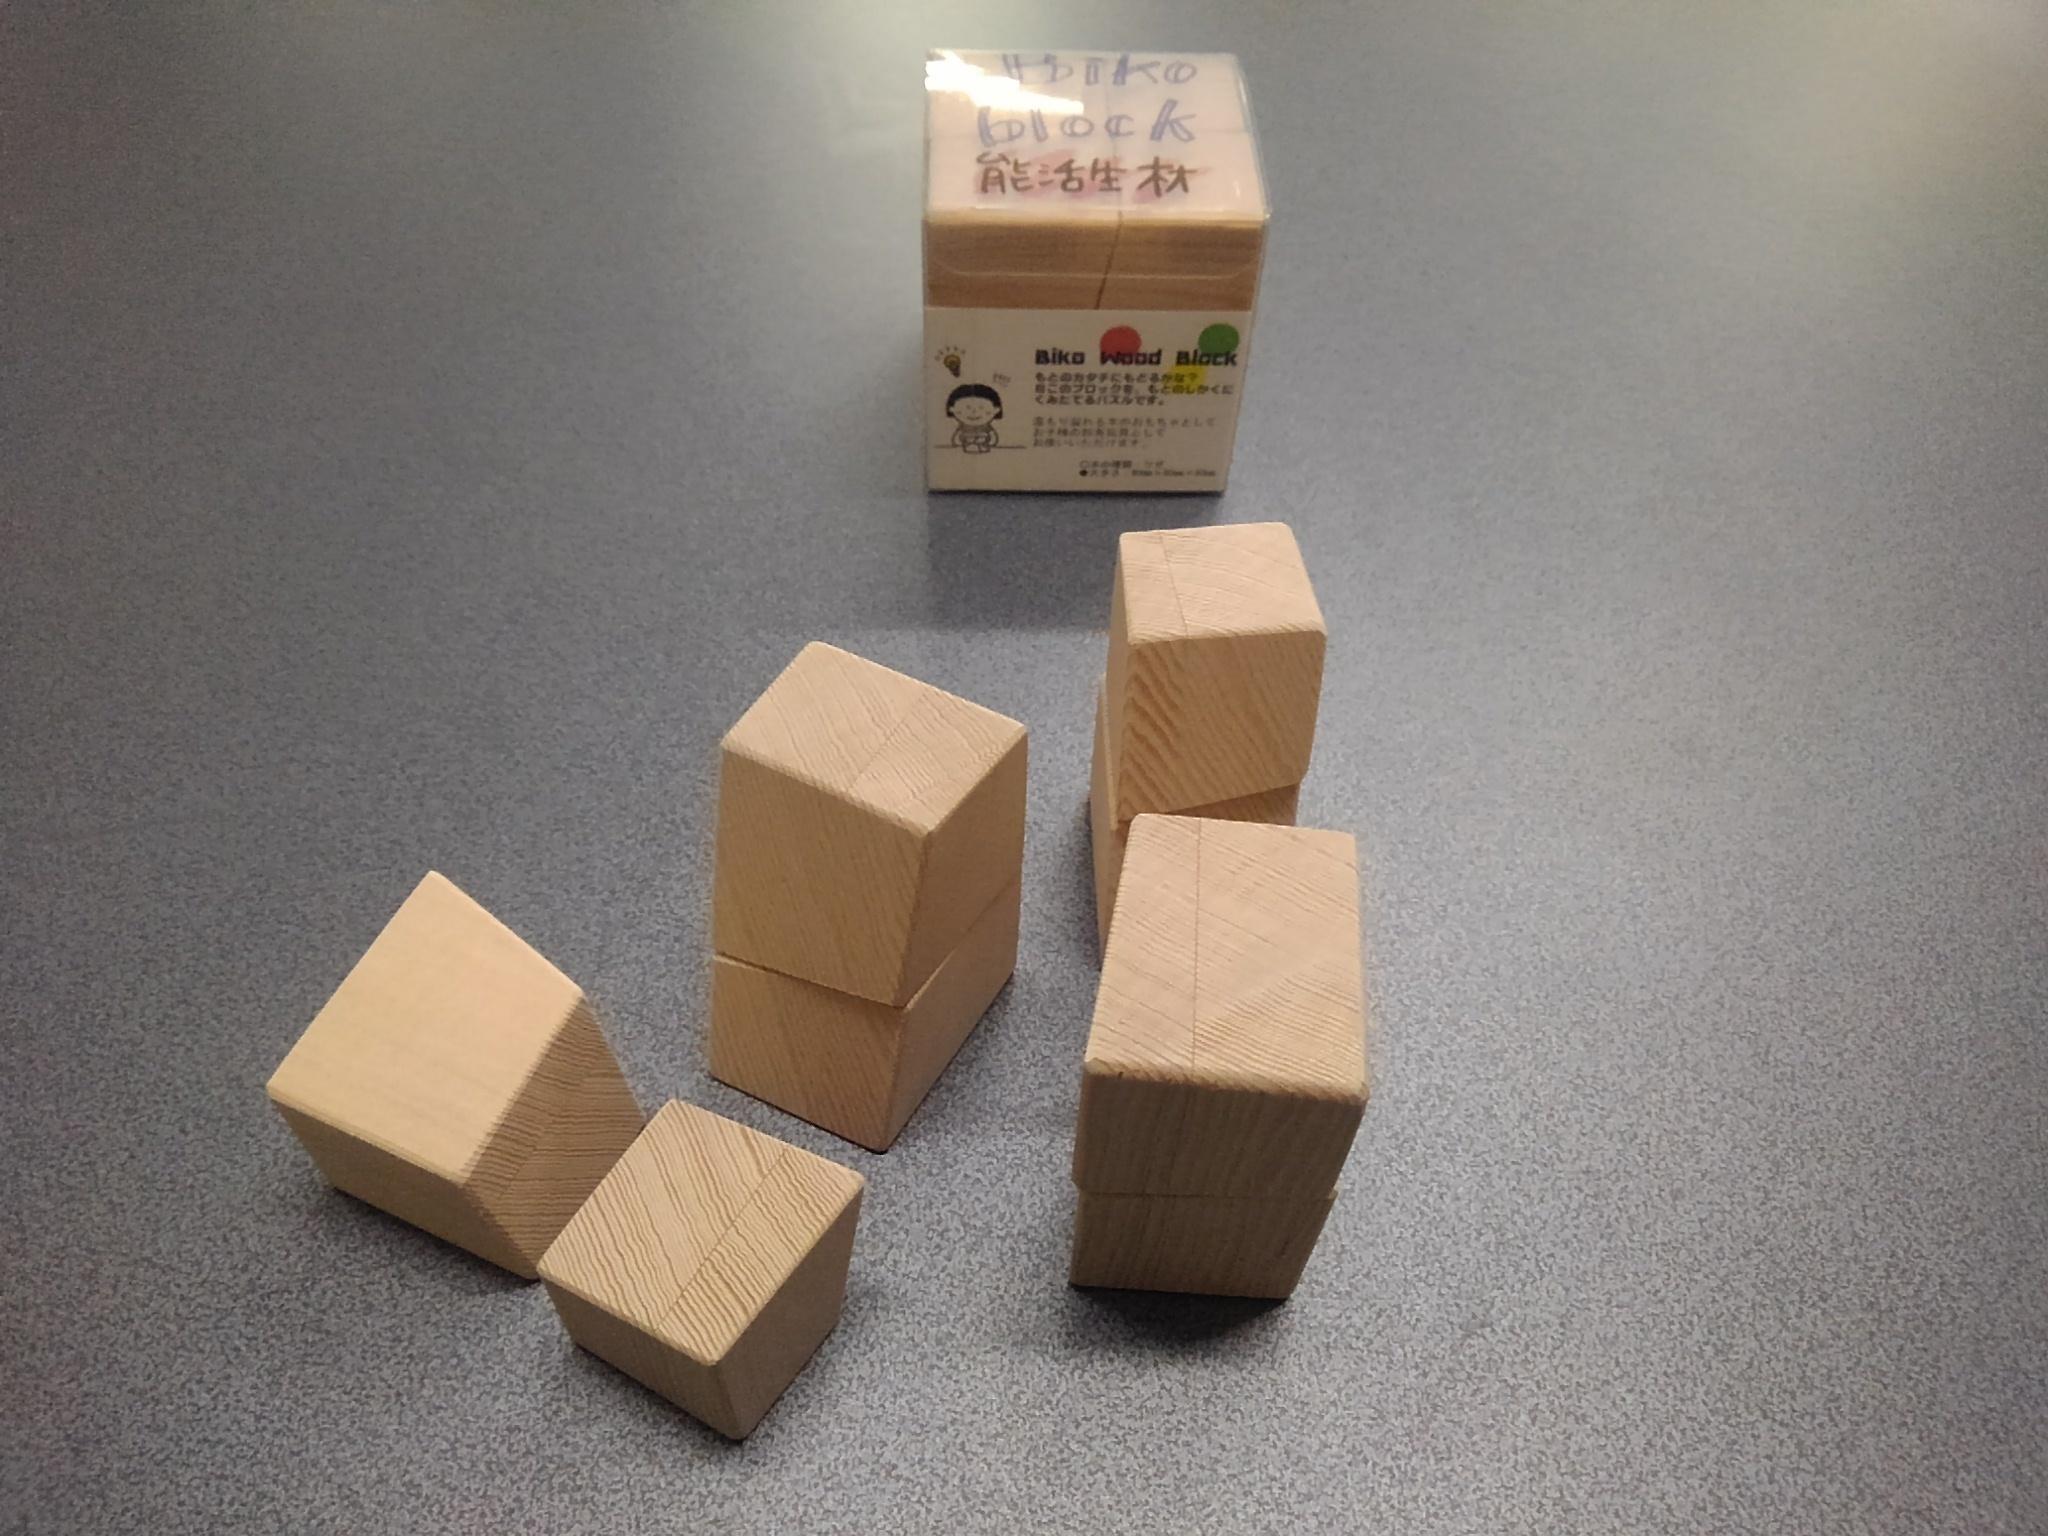 Bikoblock(ビコーブロック) - 画像3